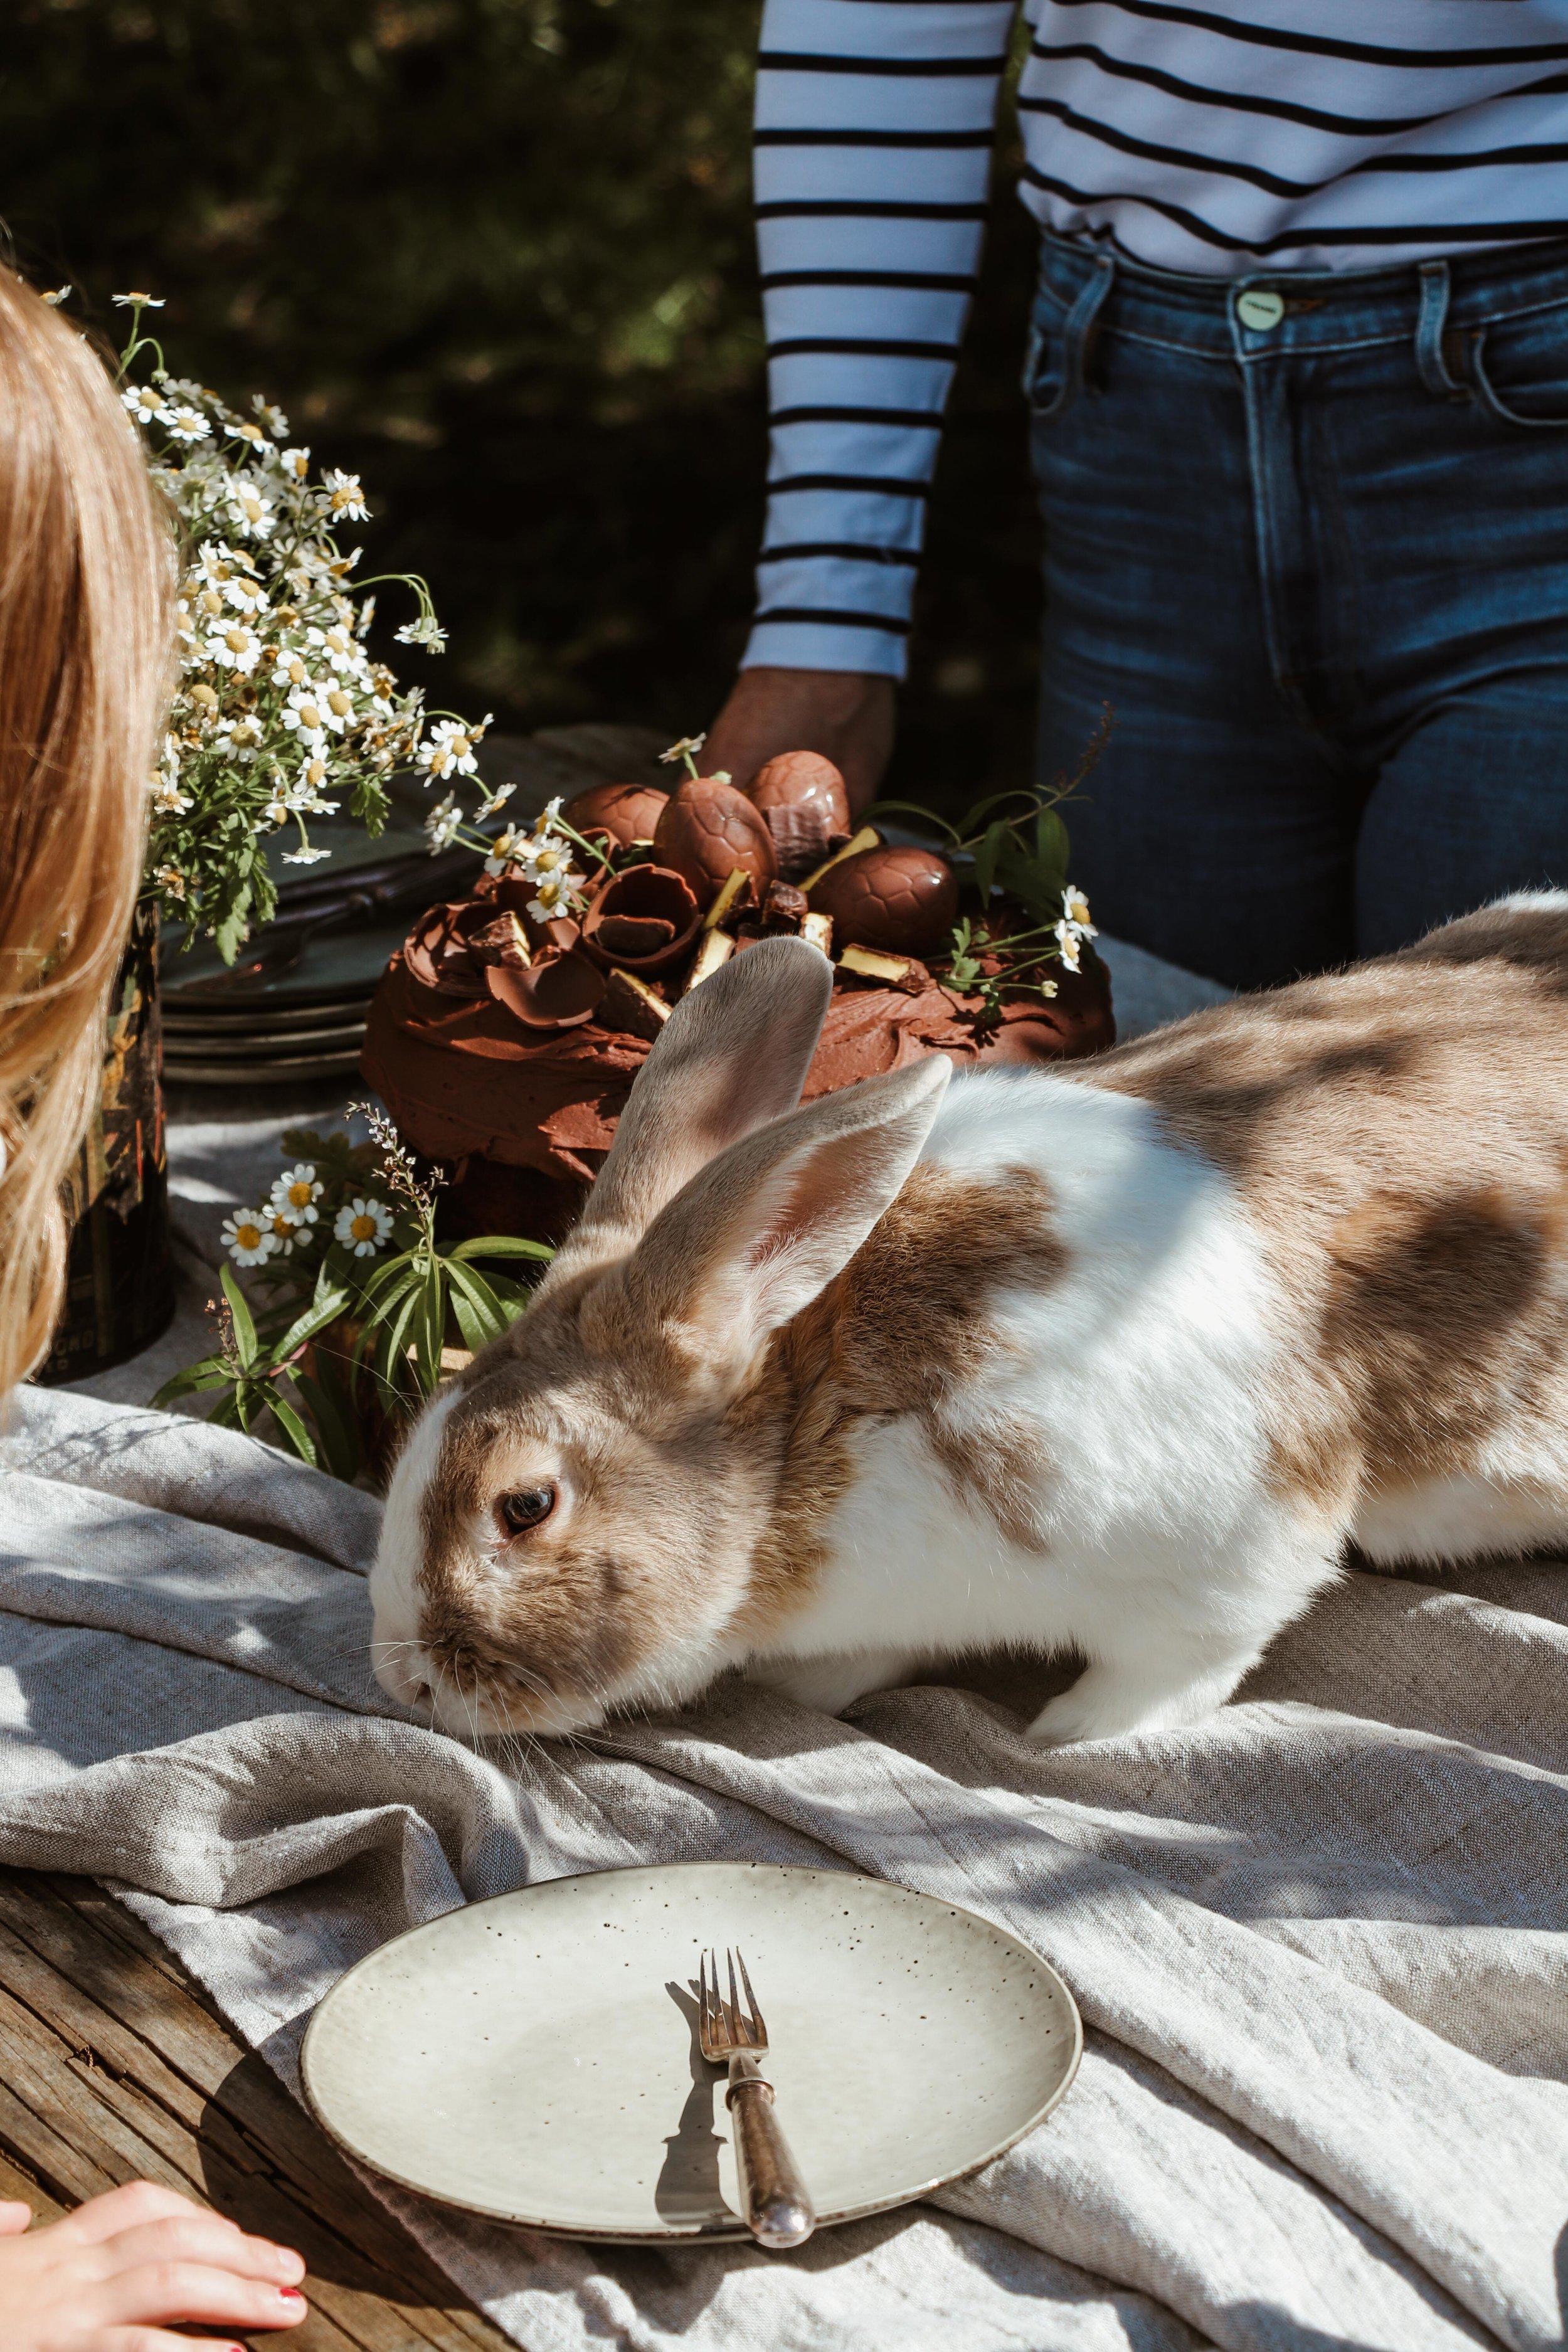 The giant Flemish rabbit, Franklin